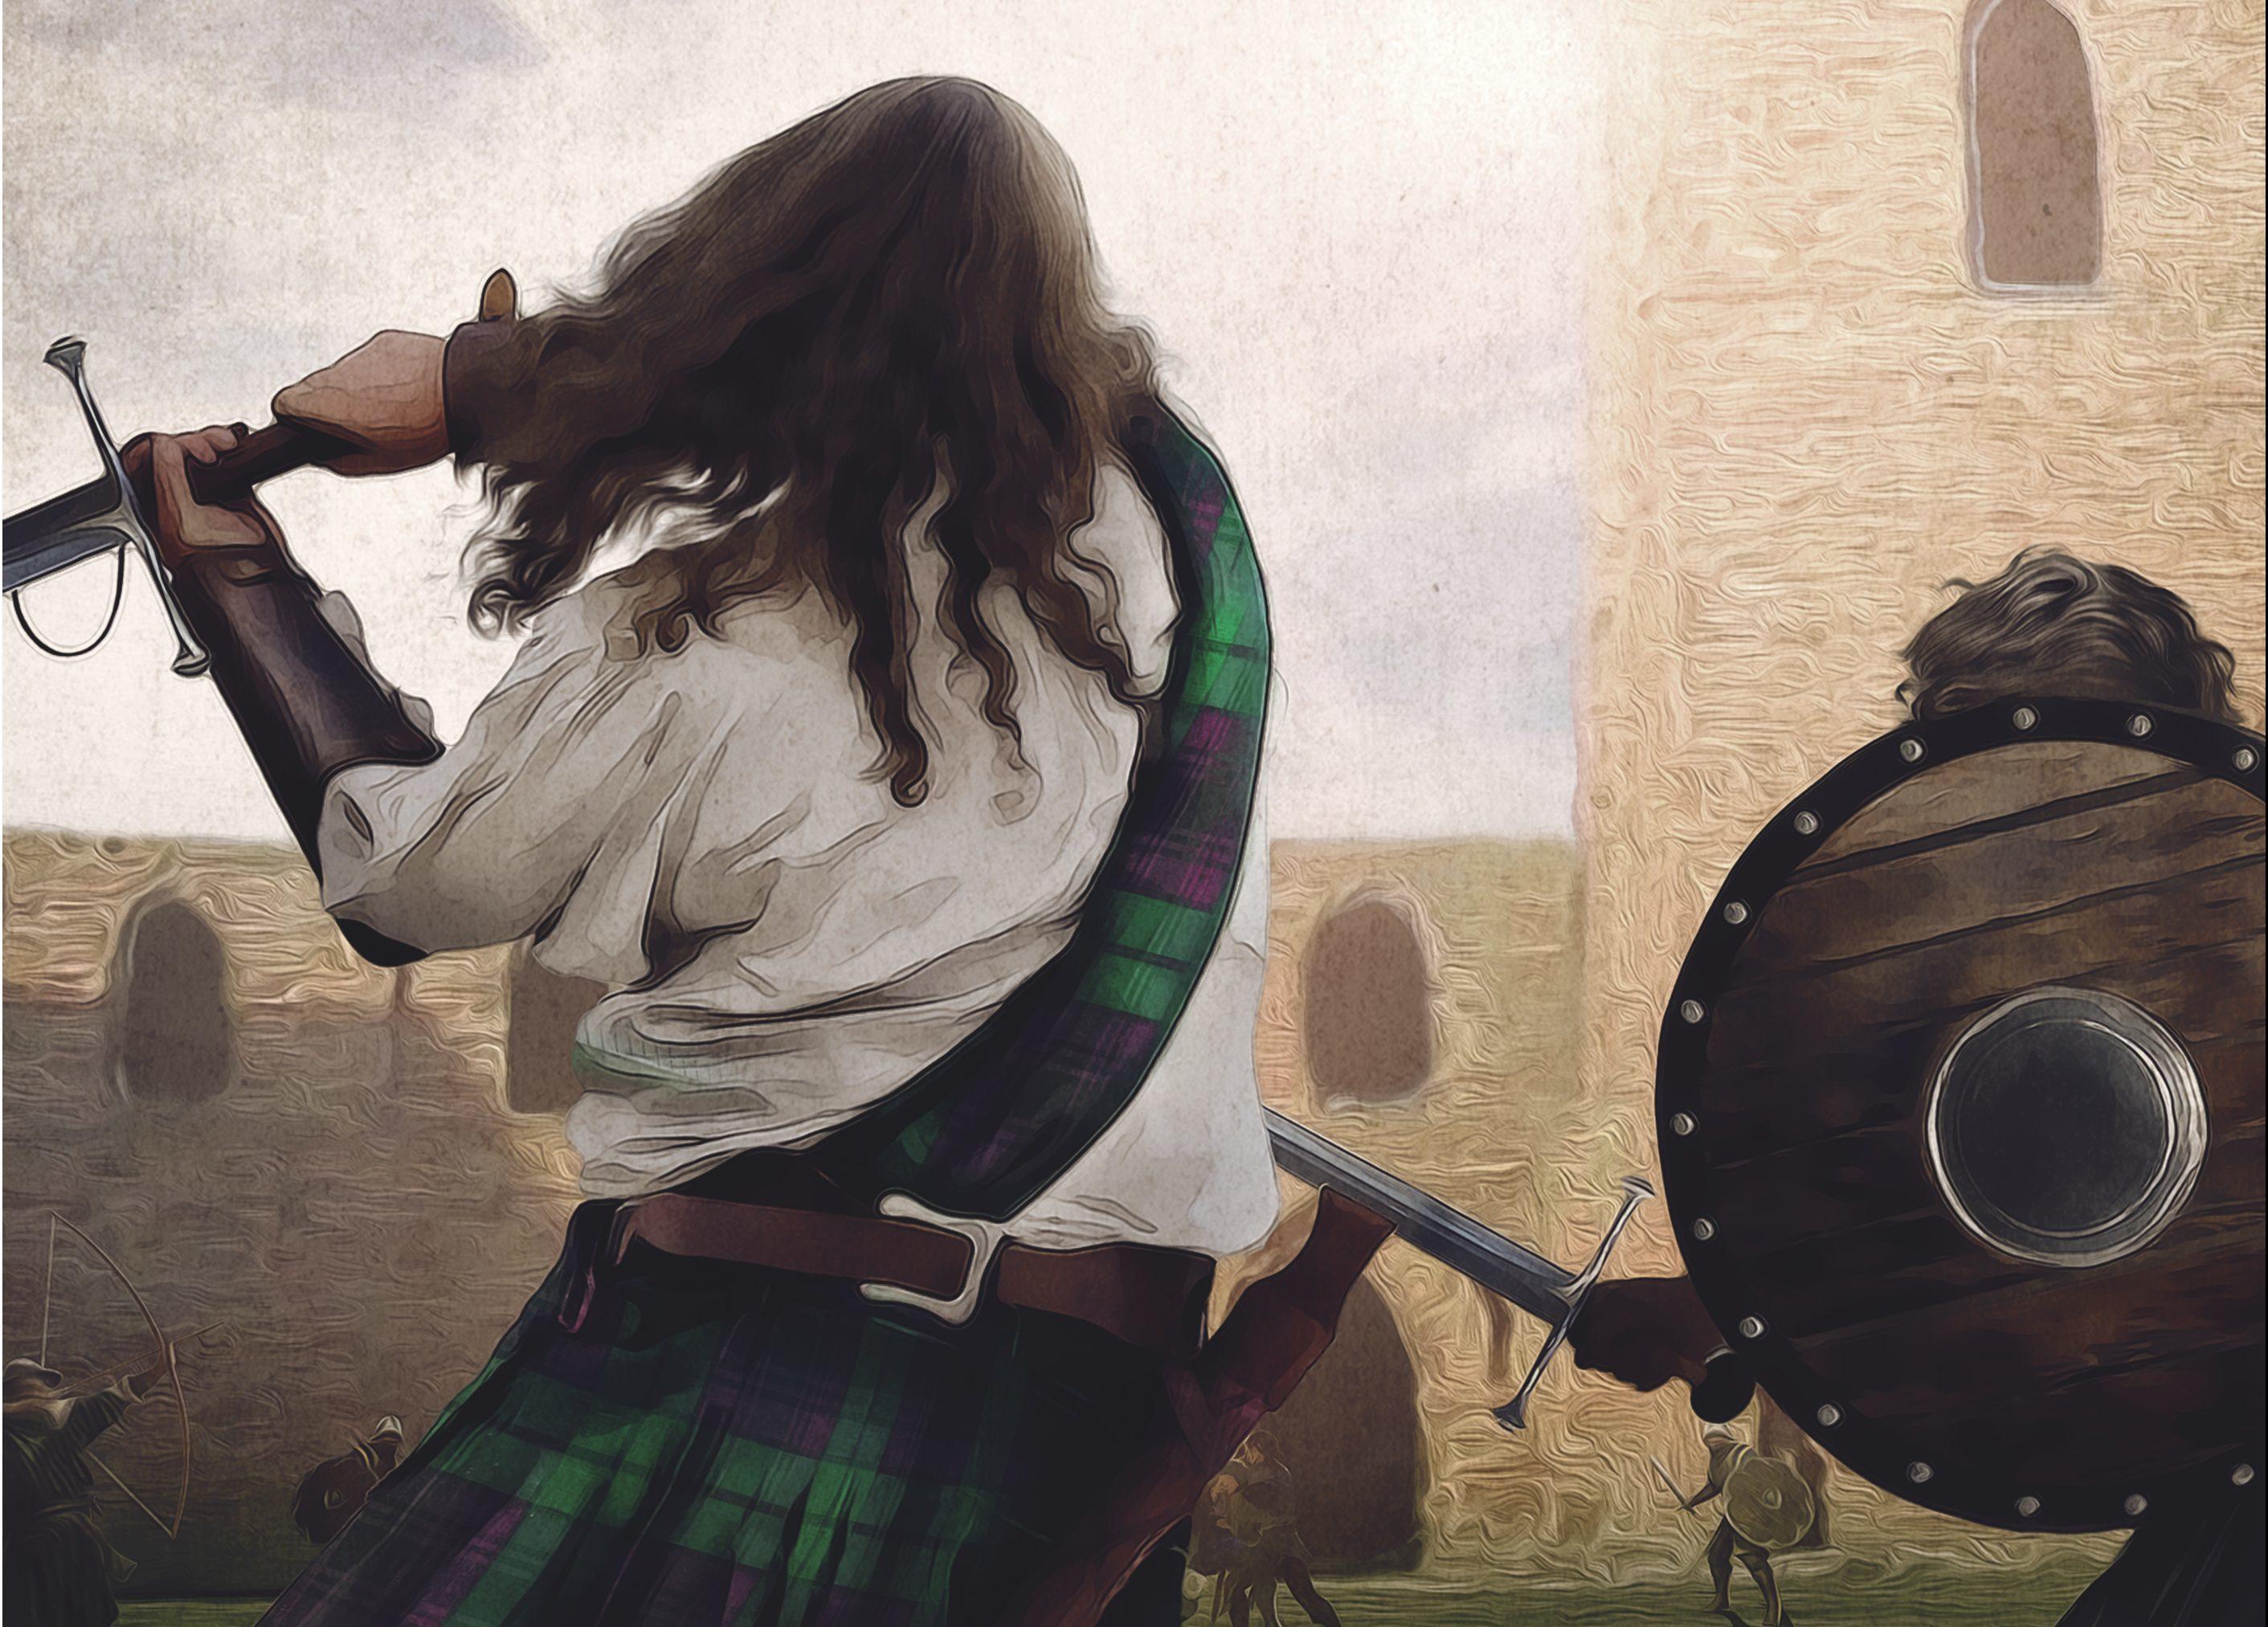 The Battle of Arbroath